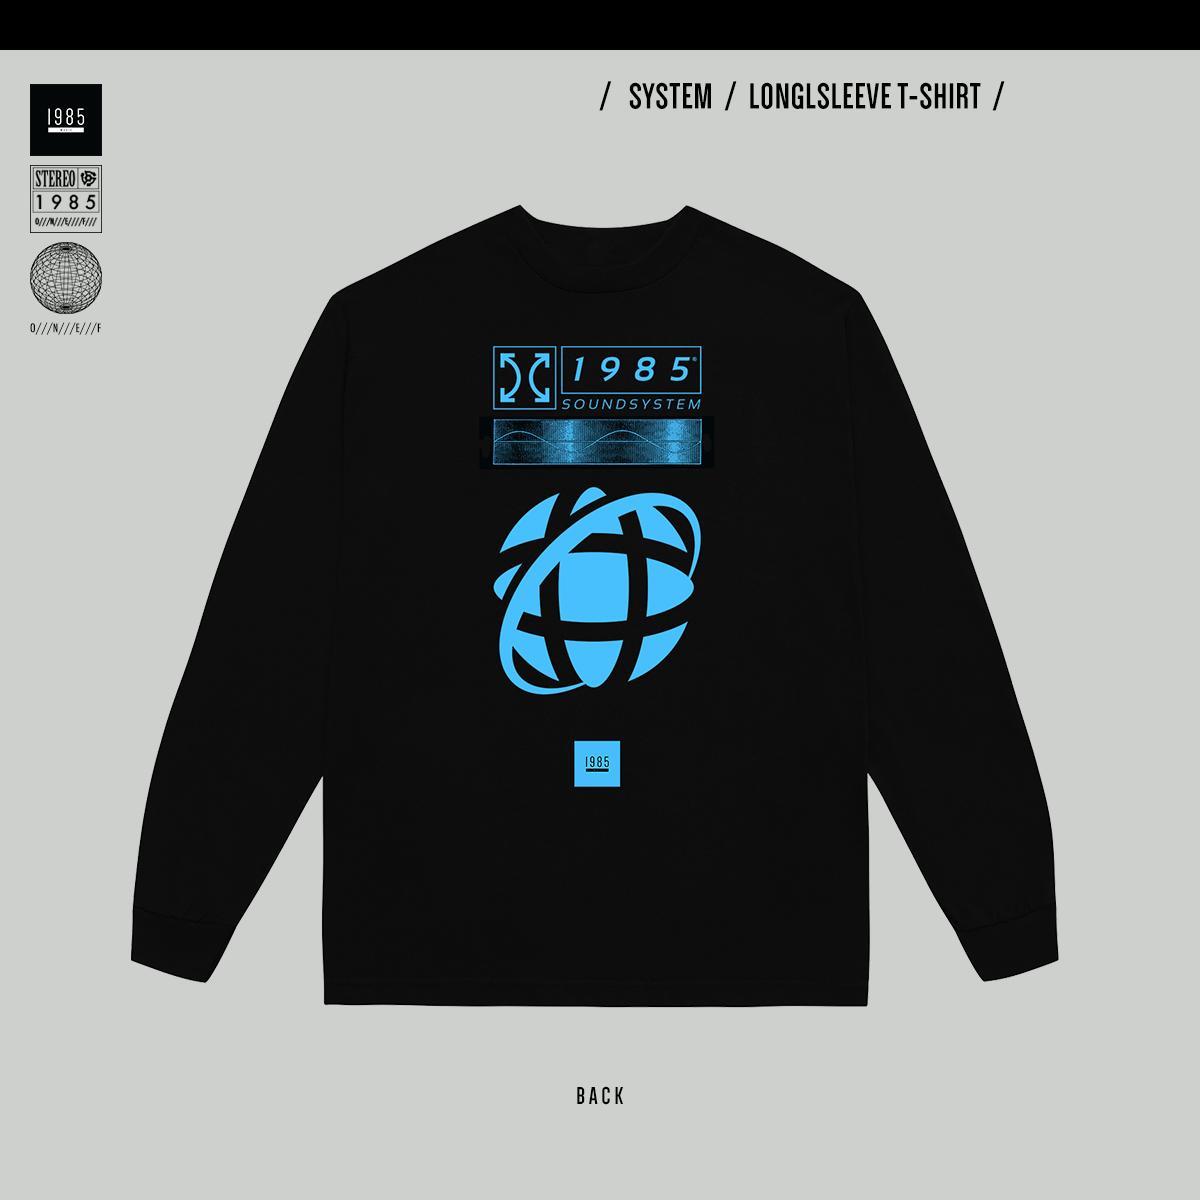 System Longsleeve T-Shirt